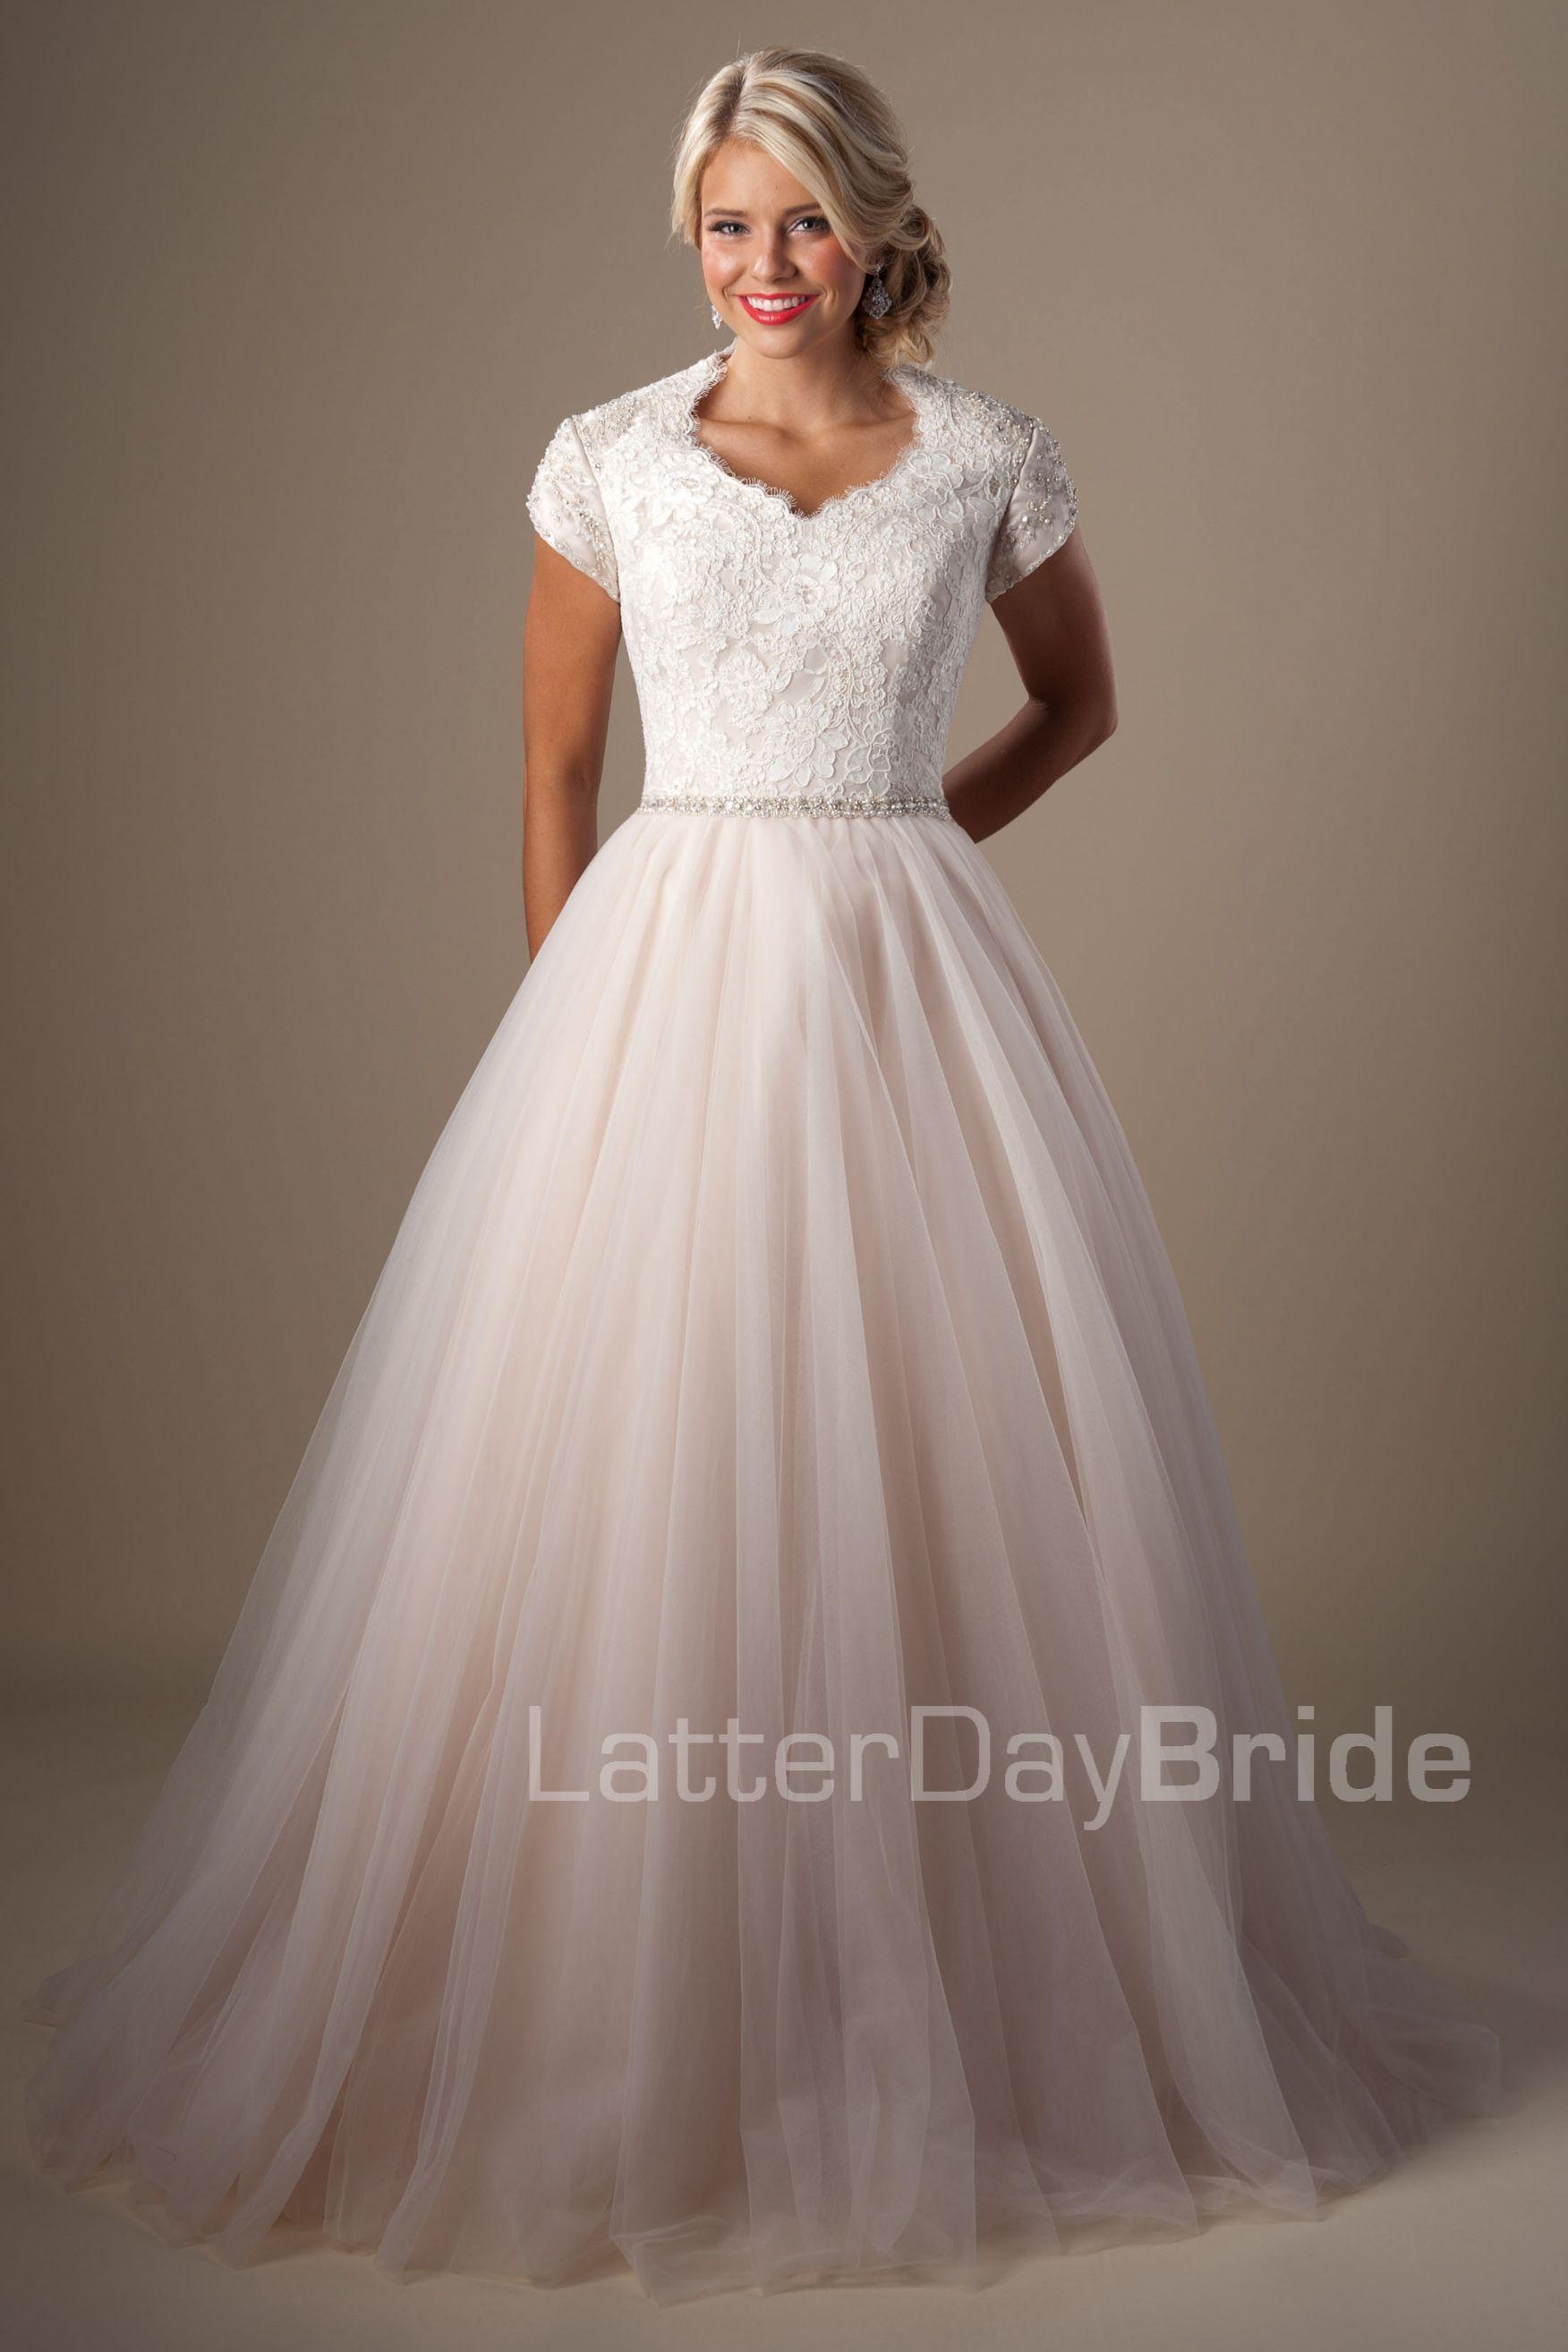 Modest wedding dresses ravenna latter day bride for Latter day wedding dresses